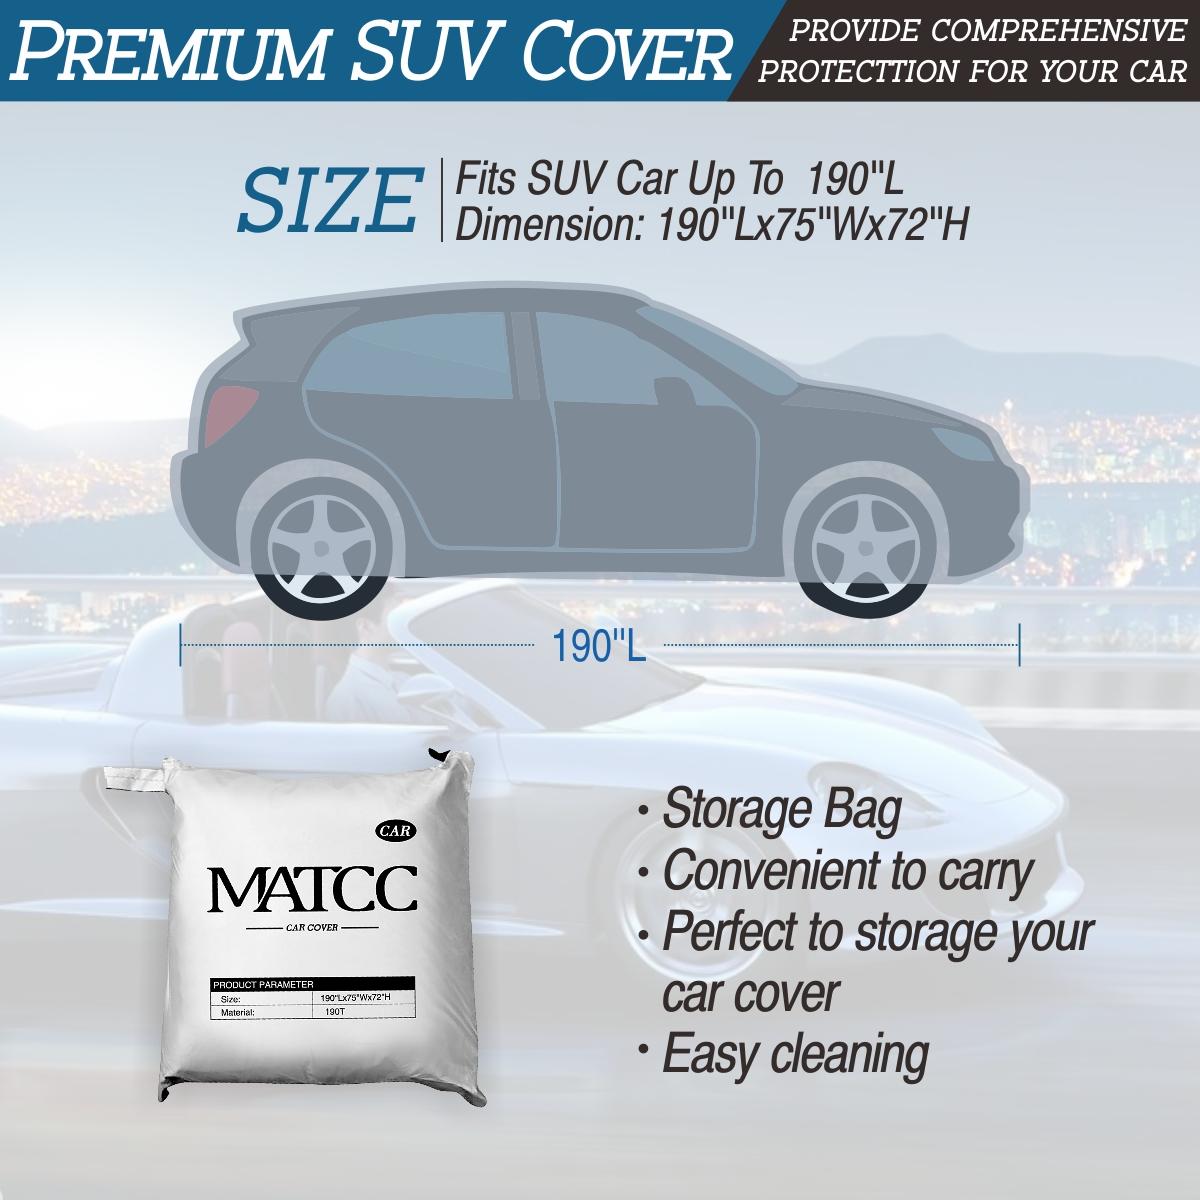 Matcc-SUV-car cover design-185''L